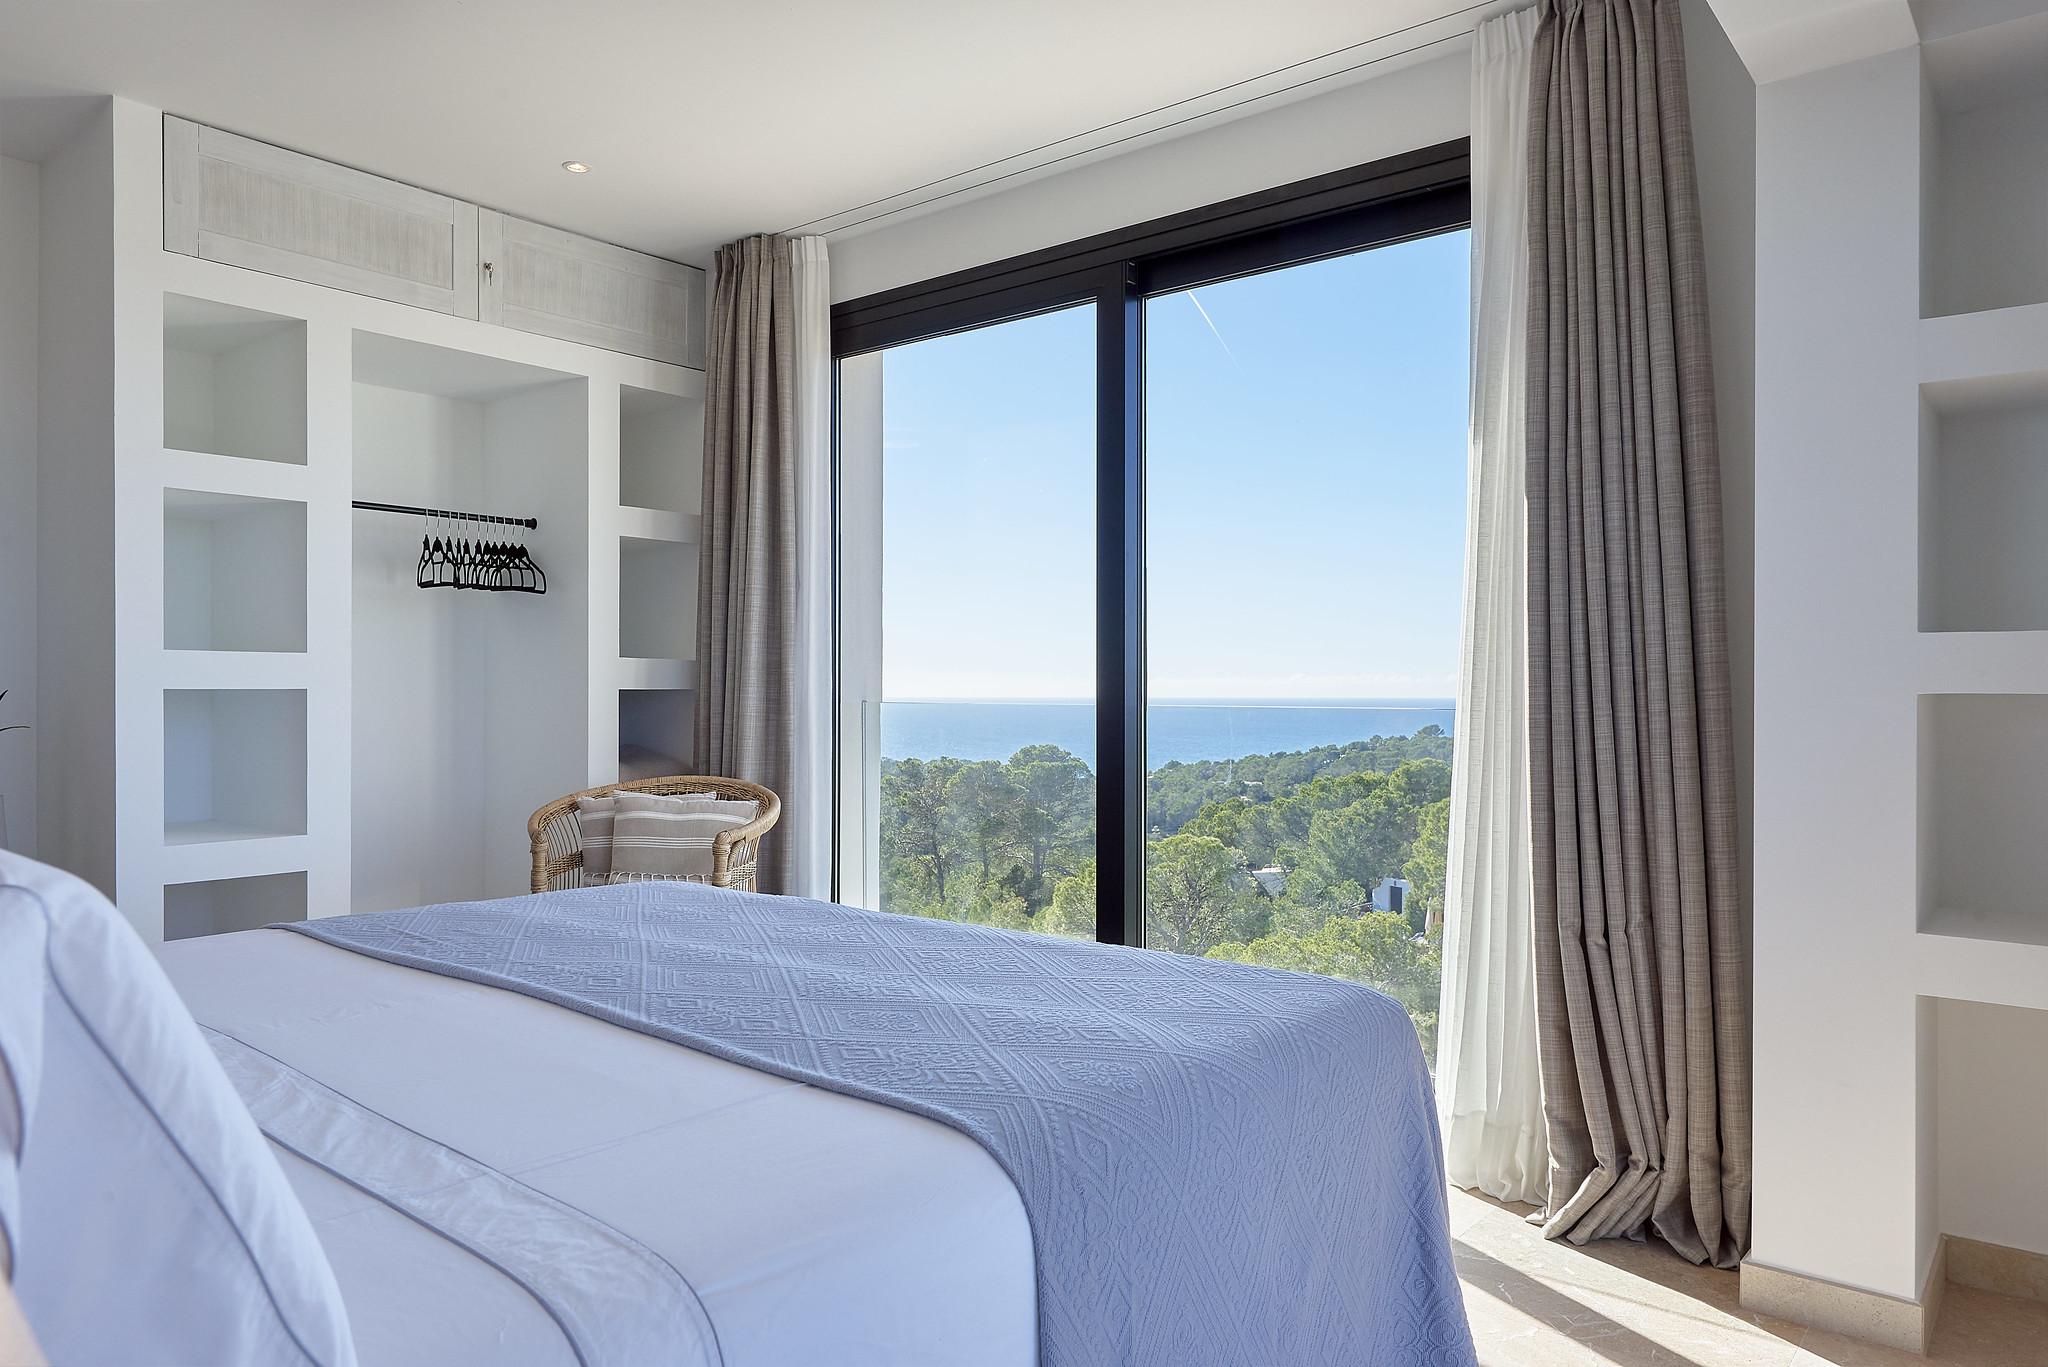 https://www.white-ibiza.com/wp-content/uploads/2020/06/white-ibiza-villas-sa-serra-interior-bedroom5.jpg